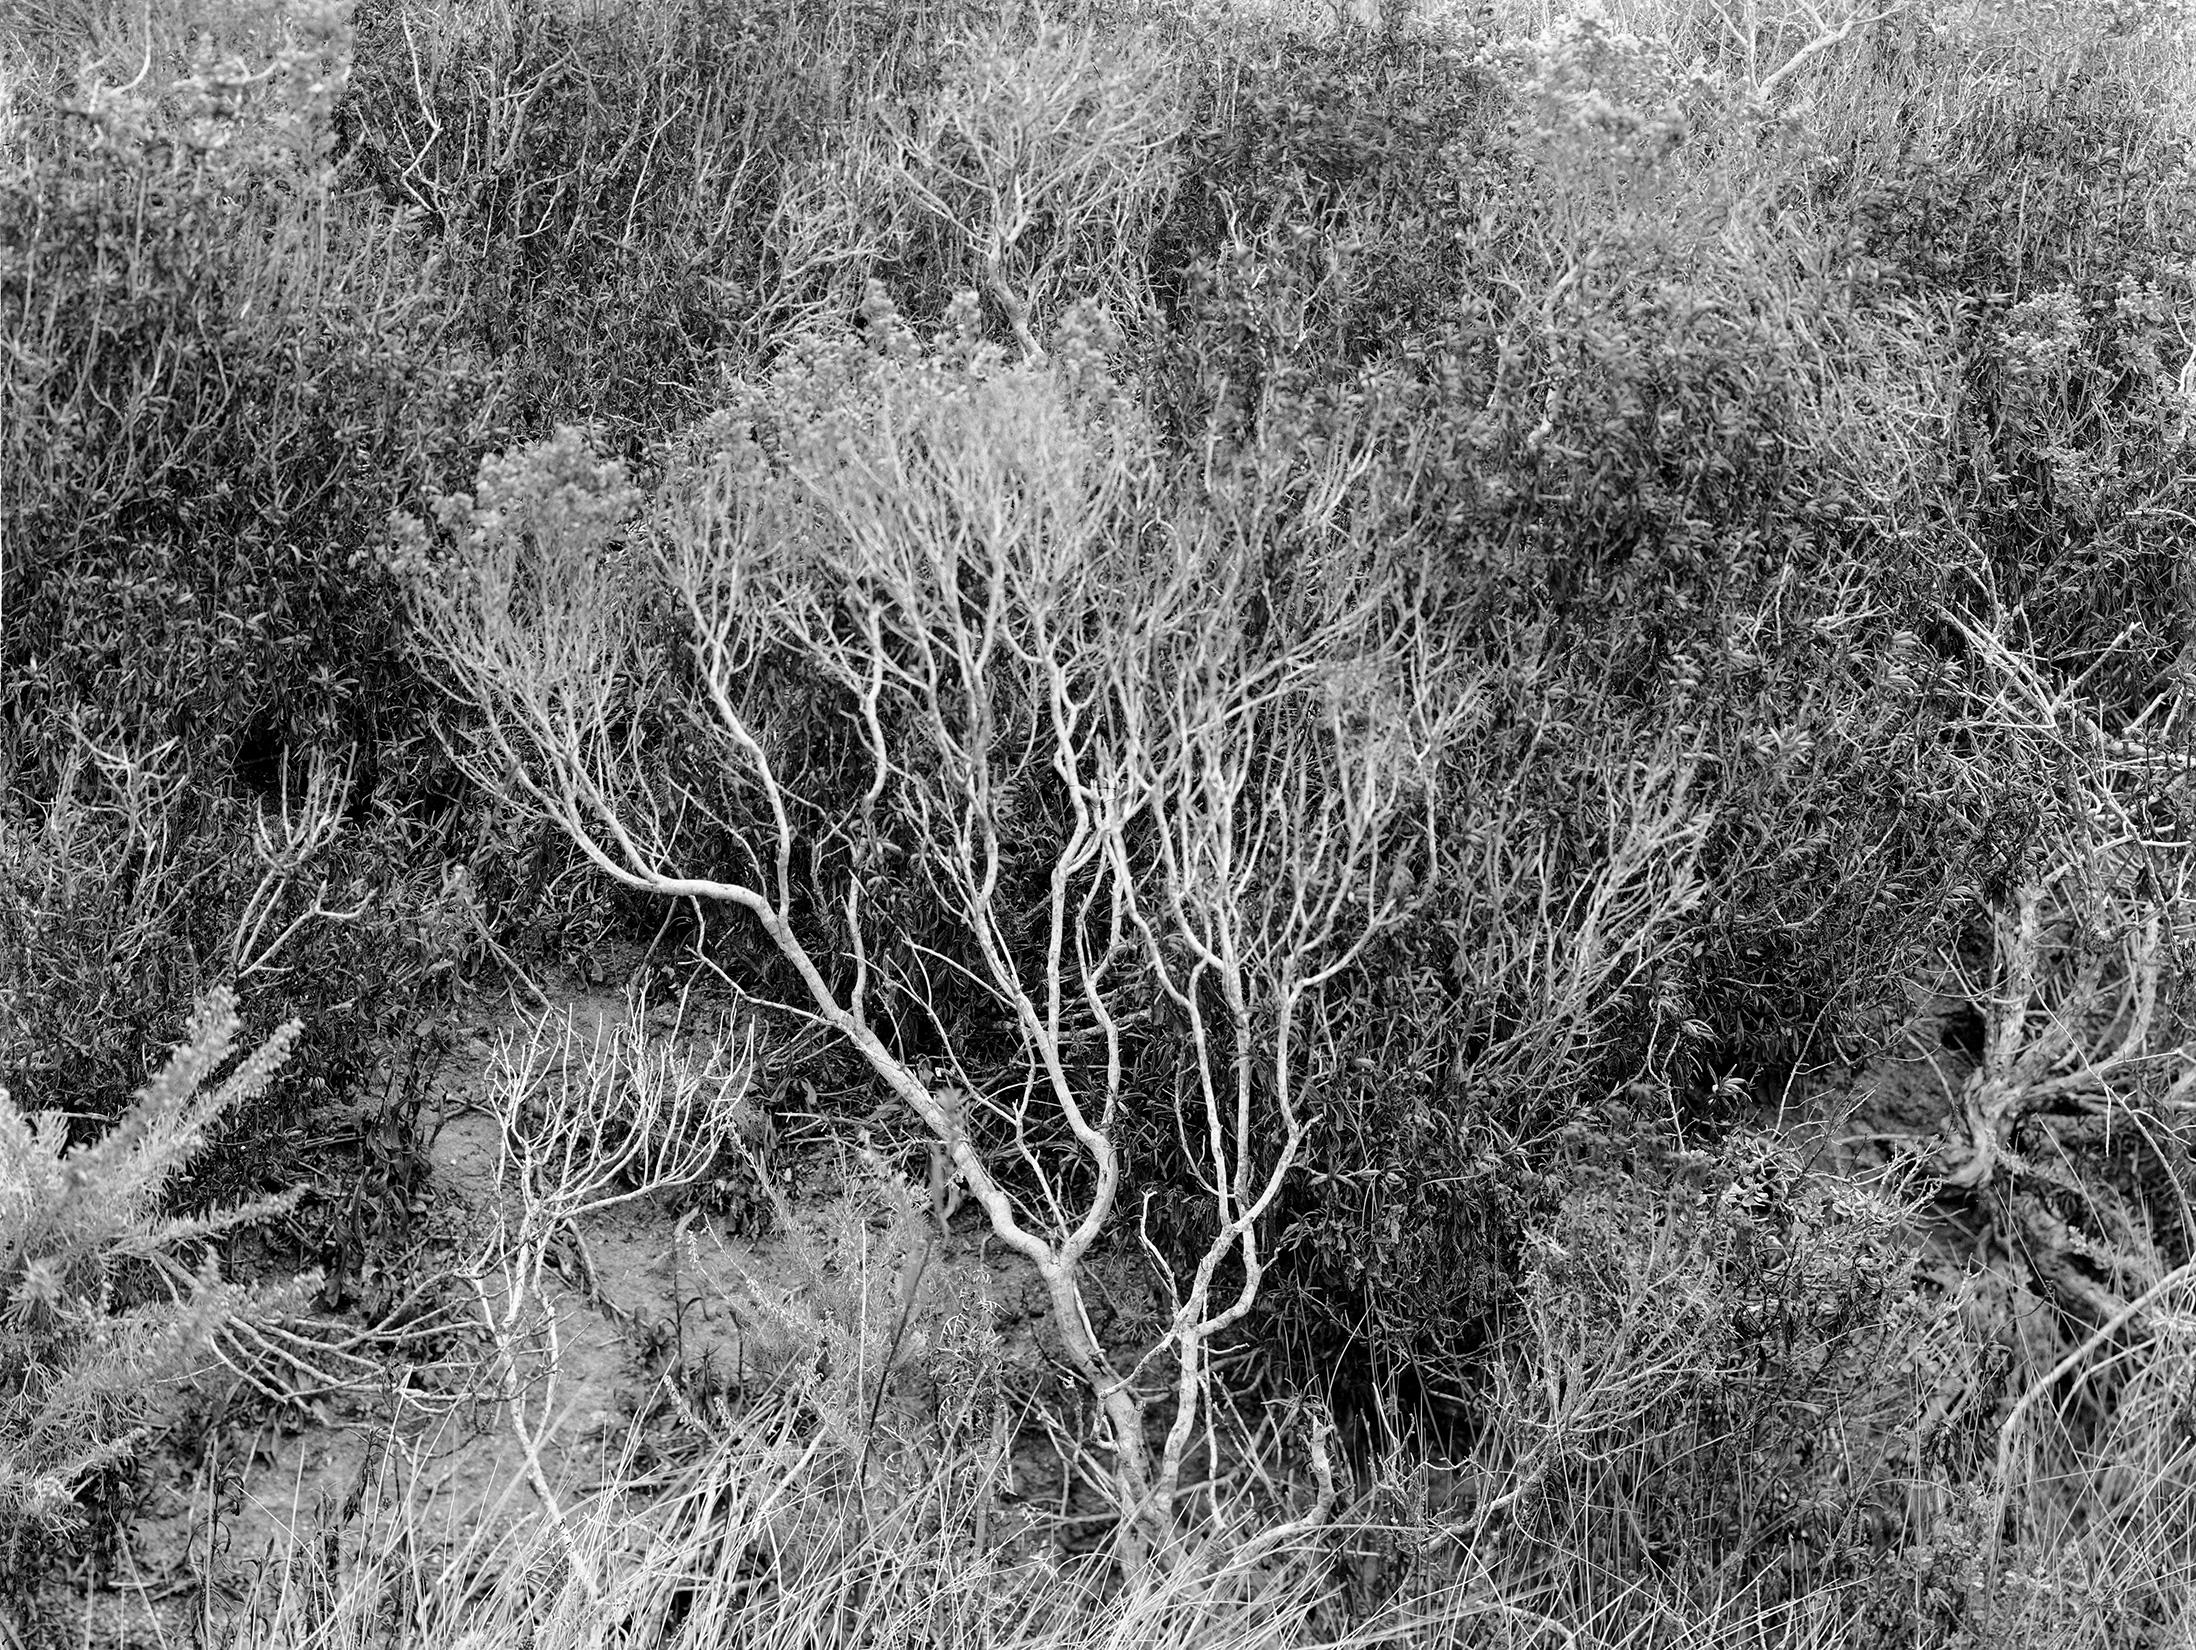 Branches, Pt. Lobos